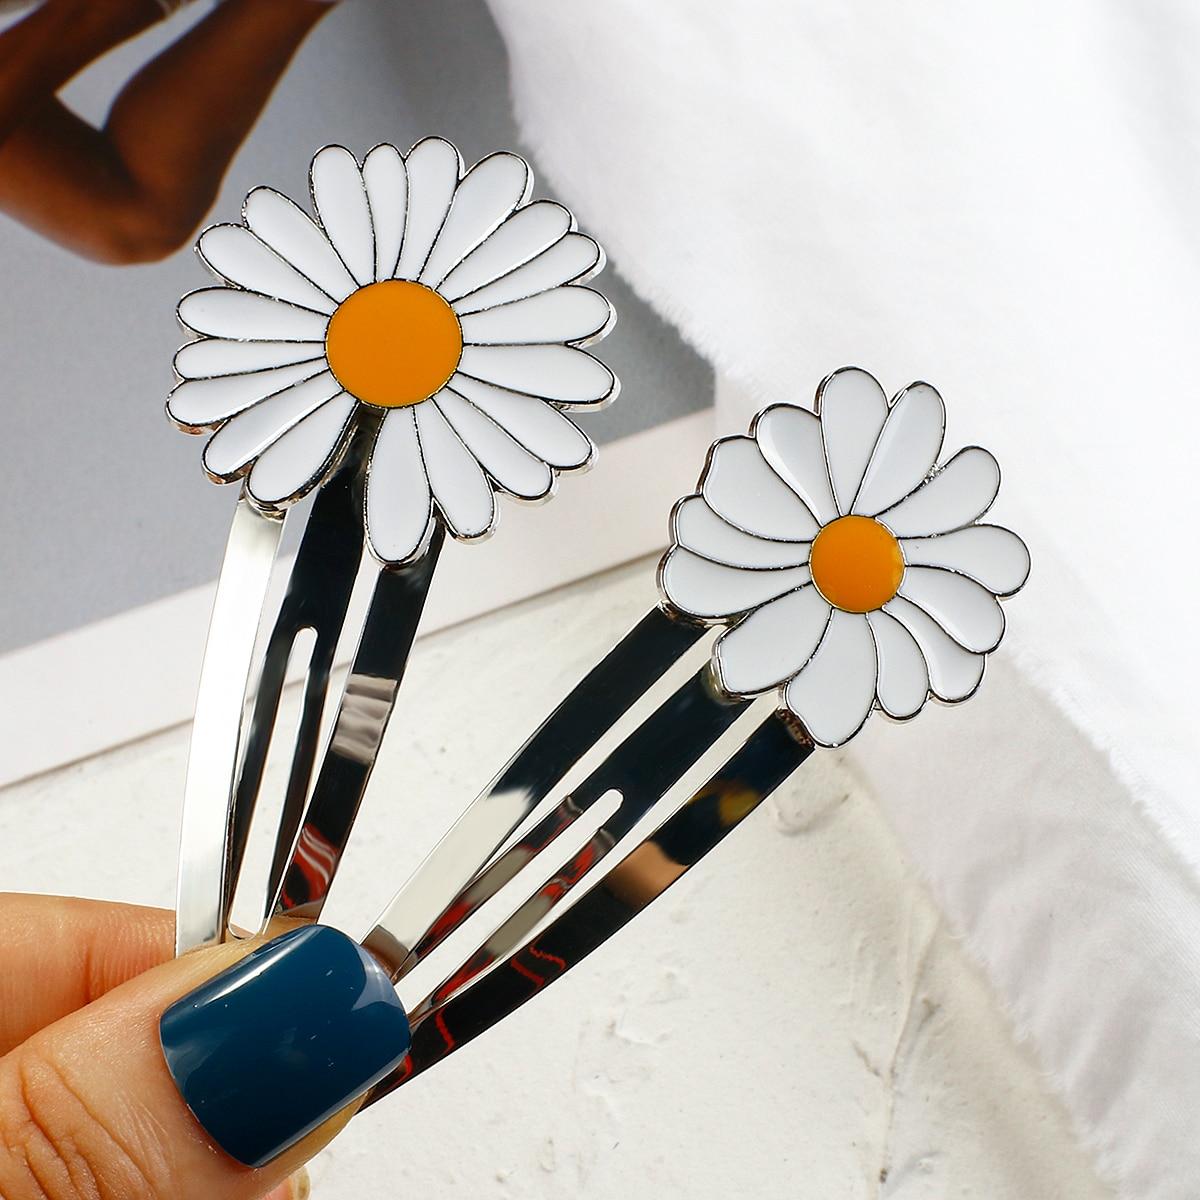 AENSOA más de moda de diamantes de imitación pelo Pin diseño único Barrette del pelo para mujeres cristal pelo Clip carta accesorio de joyería del pelo